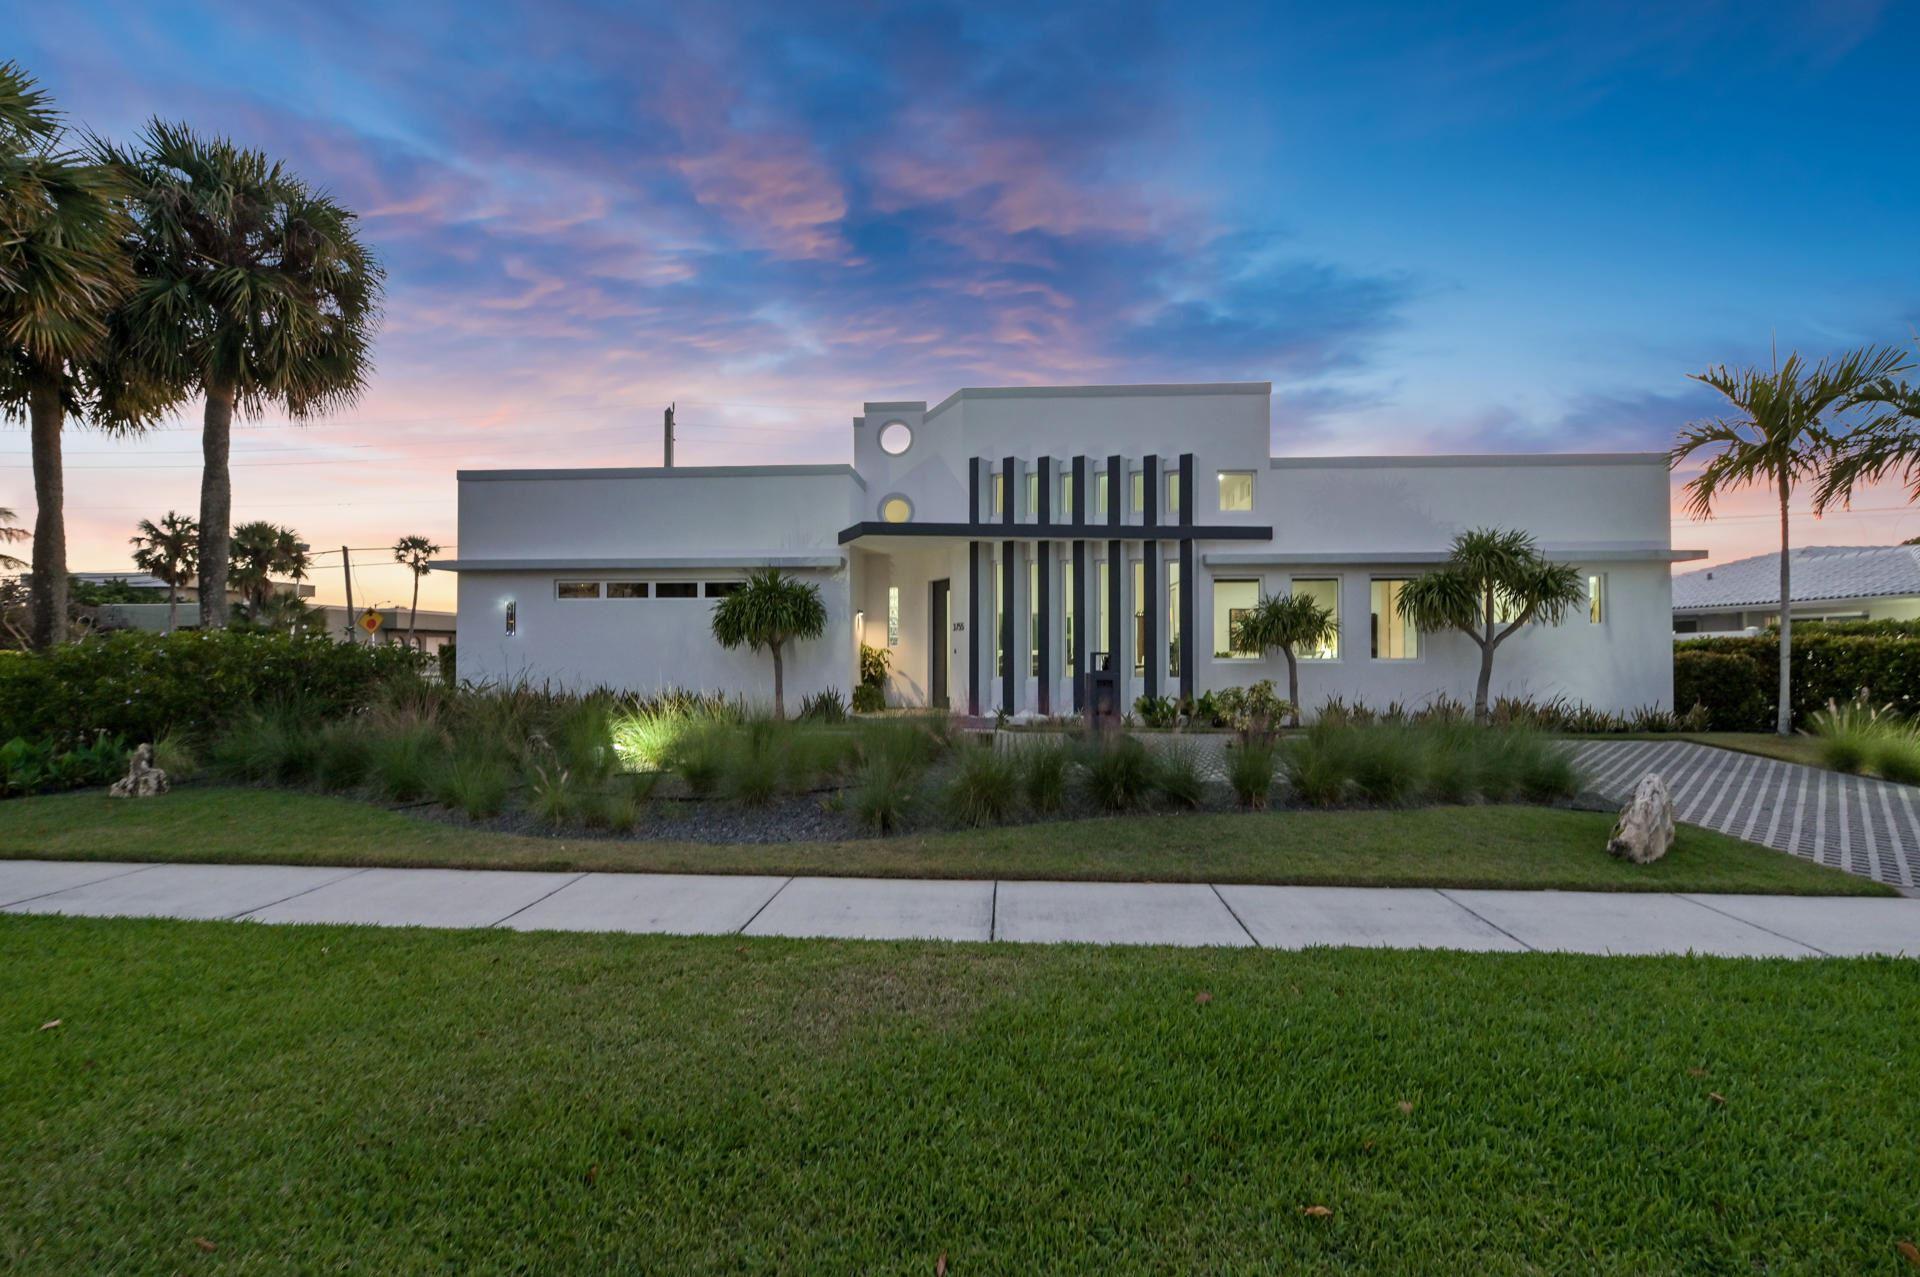 3755 NE 6th Drive, Boca Raton, FL 33431 - MLS#: RX-10704453